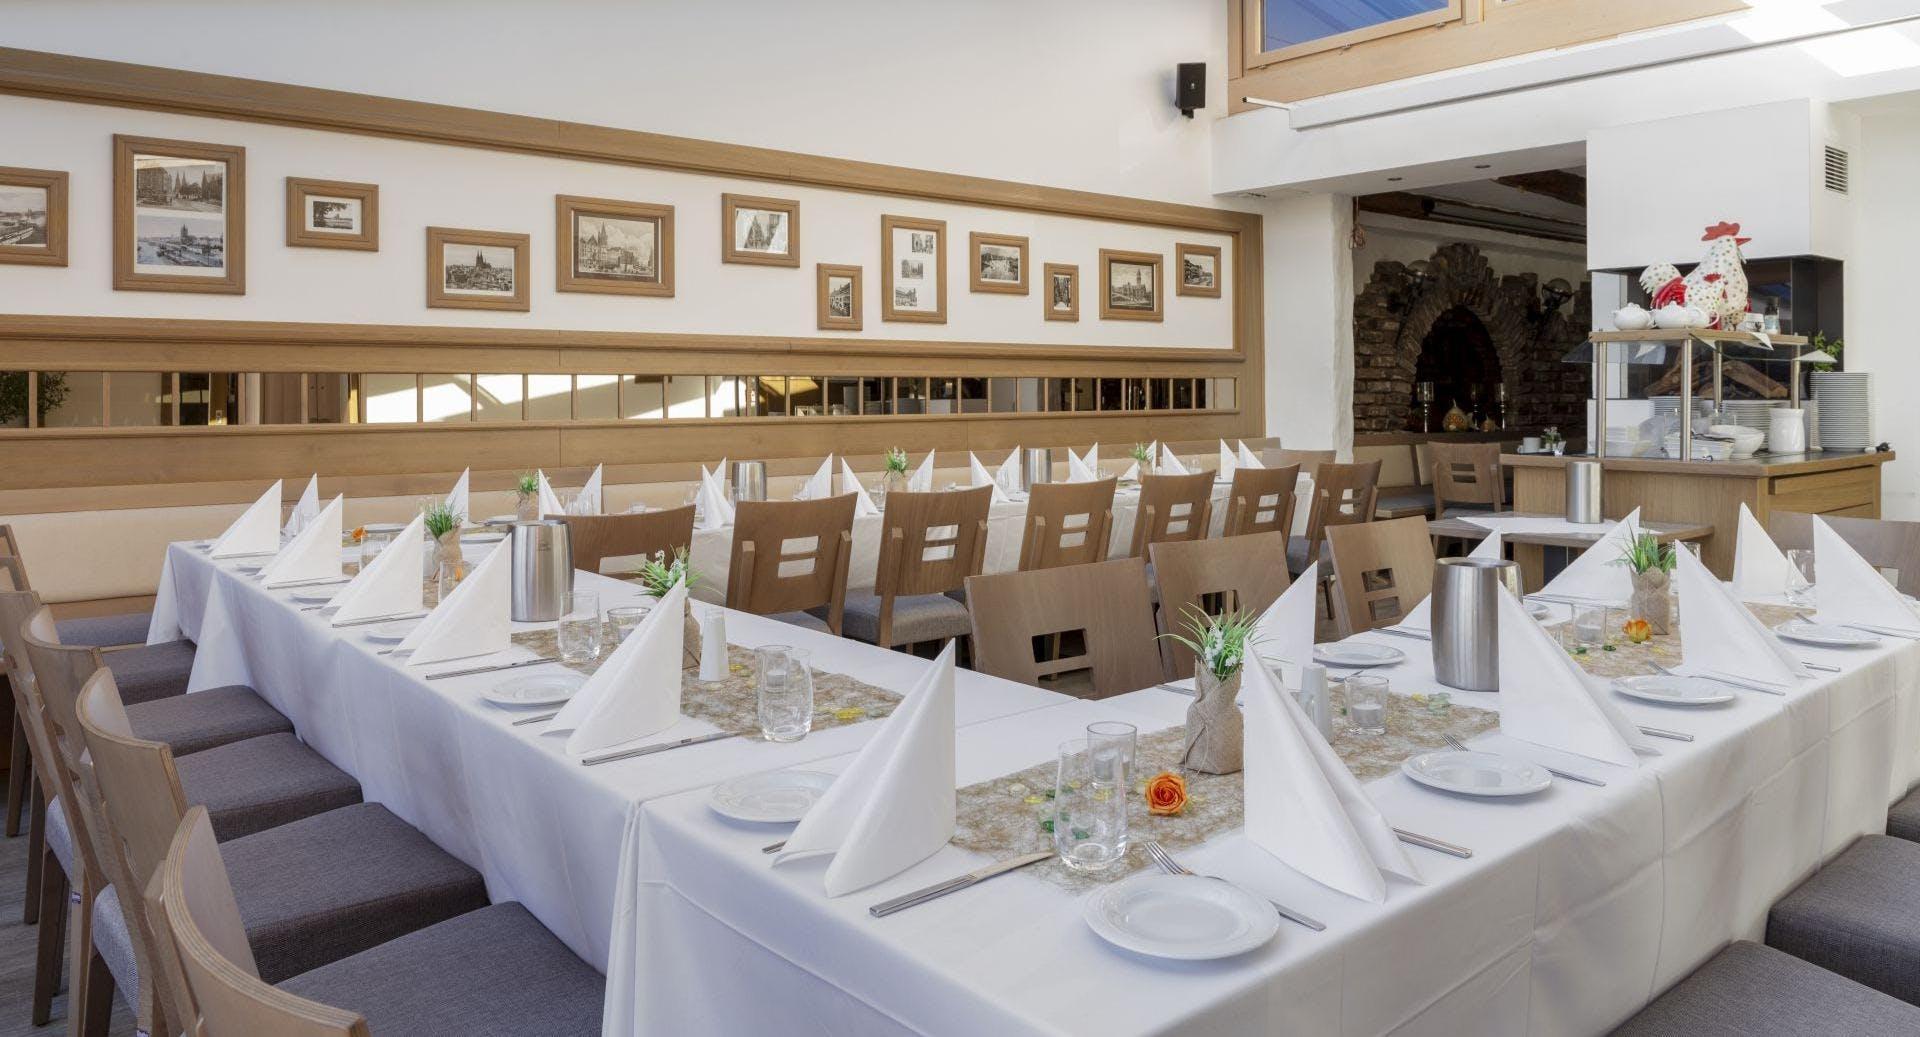 Hotel-Restaurant Triton Köln image 3